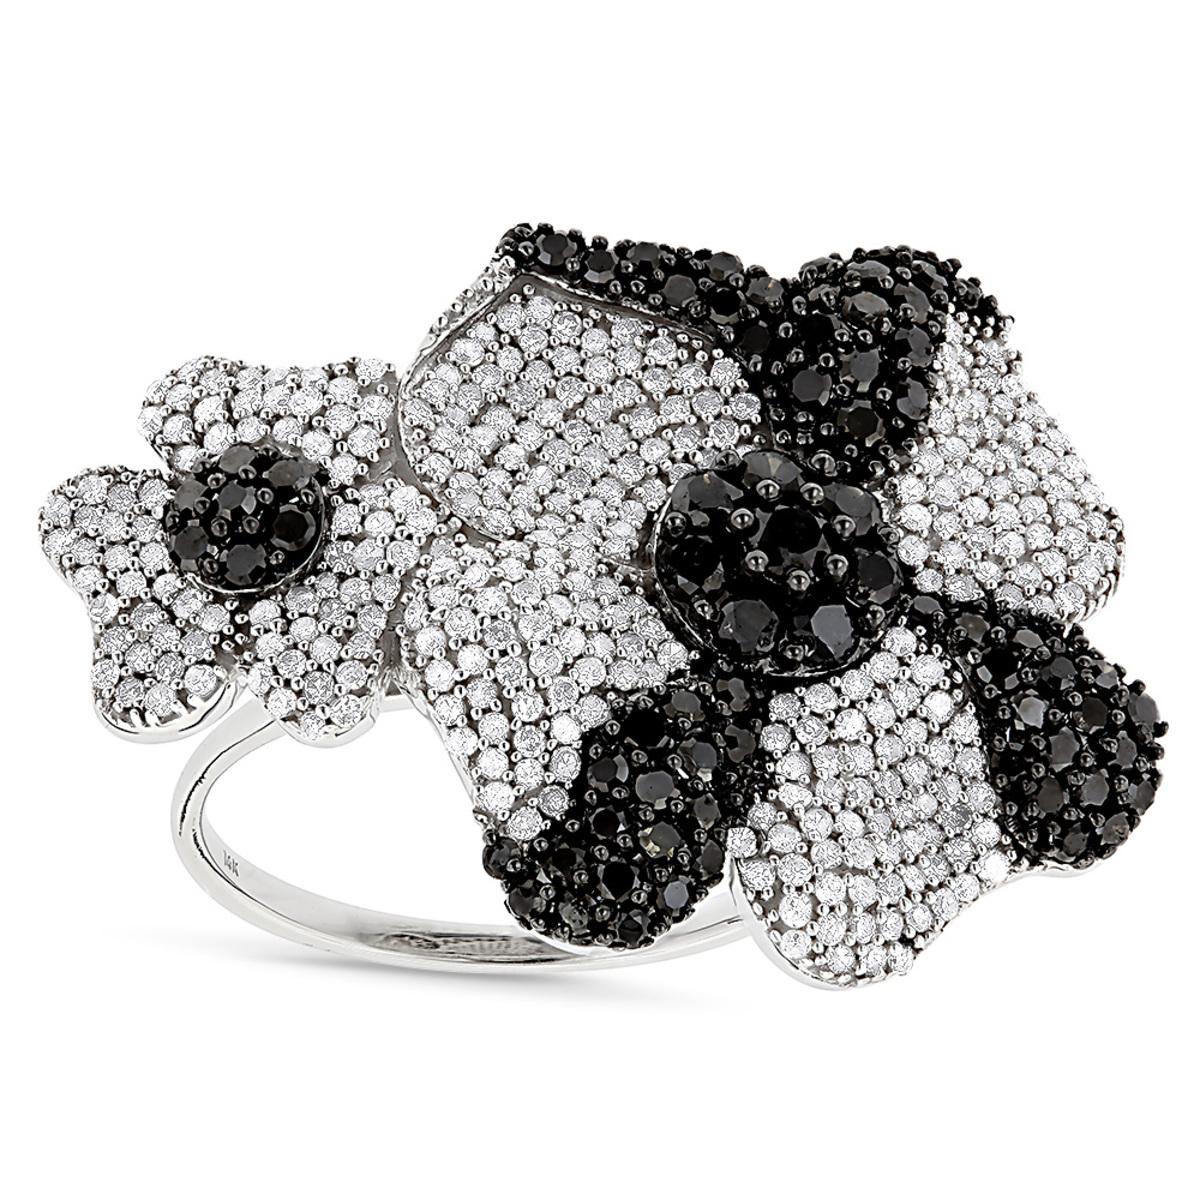 Ladies Black and White Diamond Flower Ring 2.5ct 14K